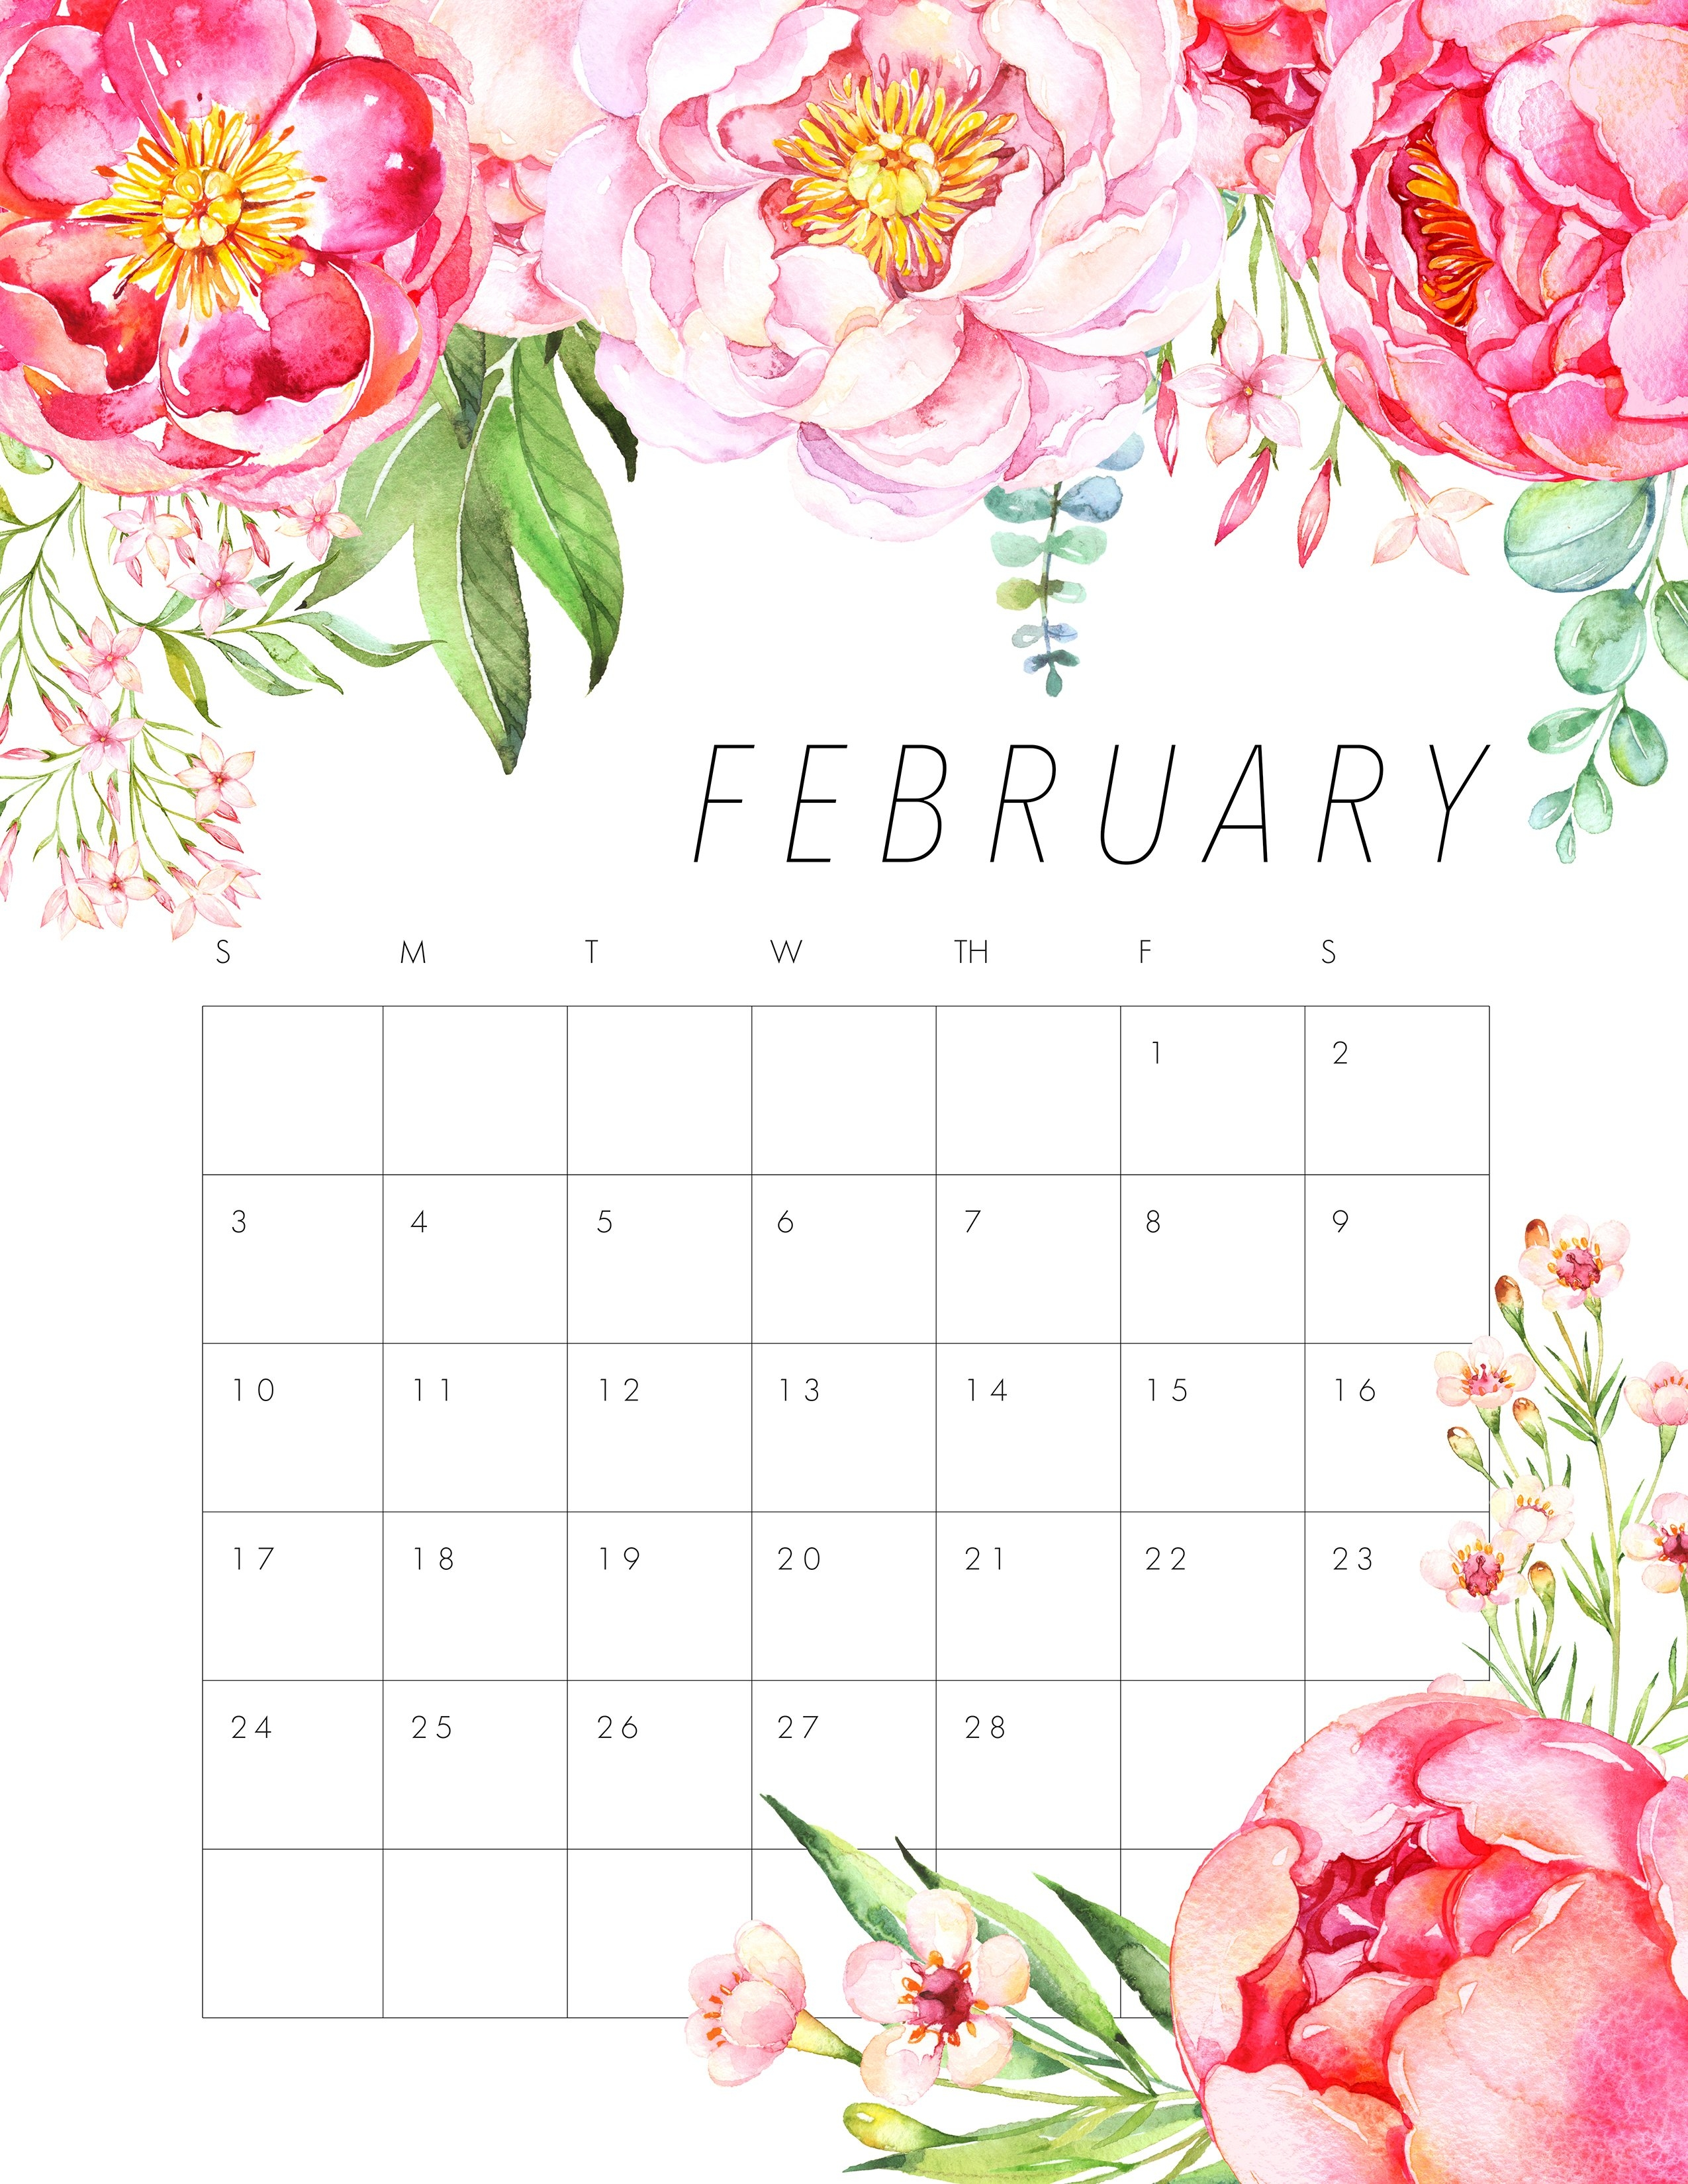 Free Printable 2019 Floral Calendar - The Cottage Market Calendar 2019 Flowers